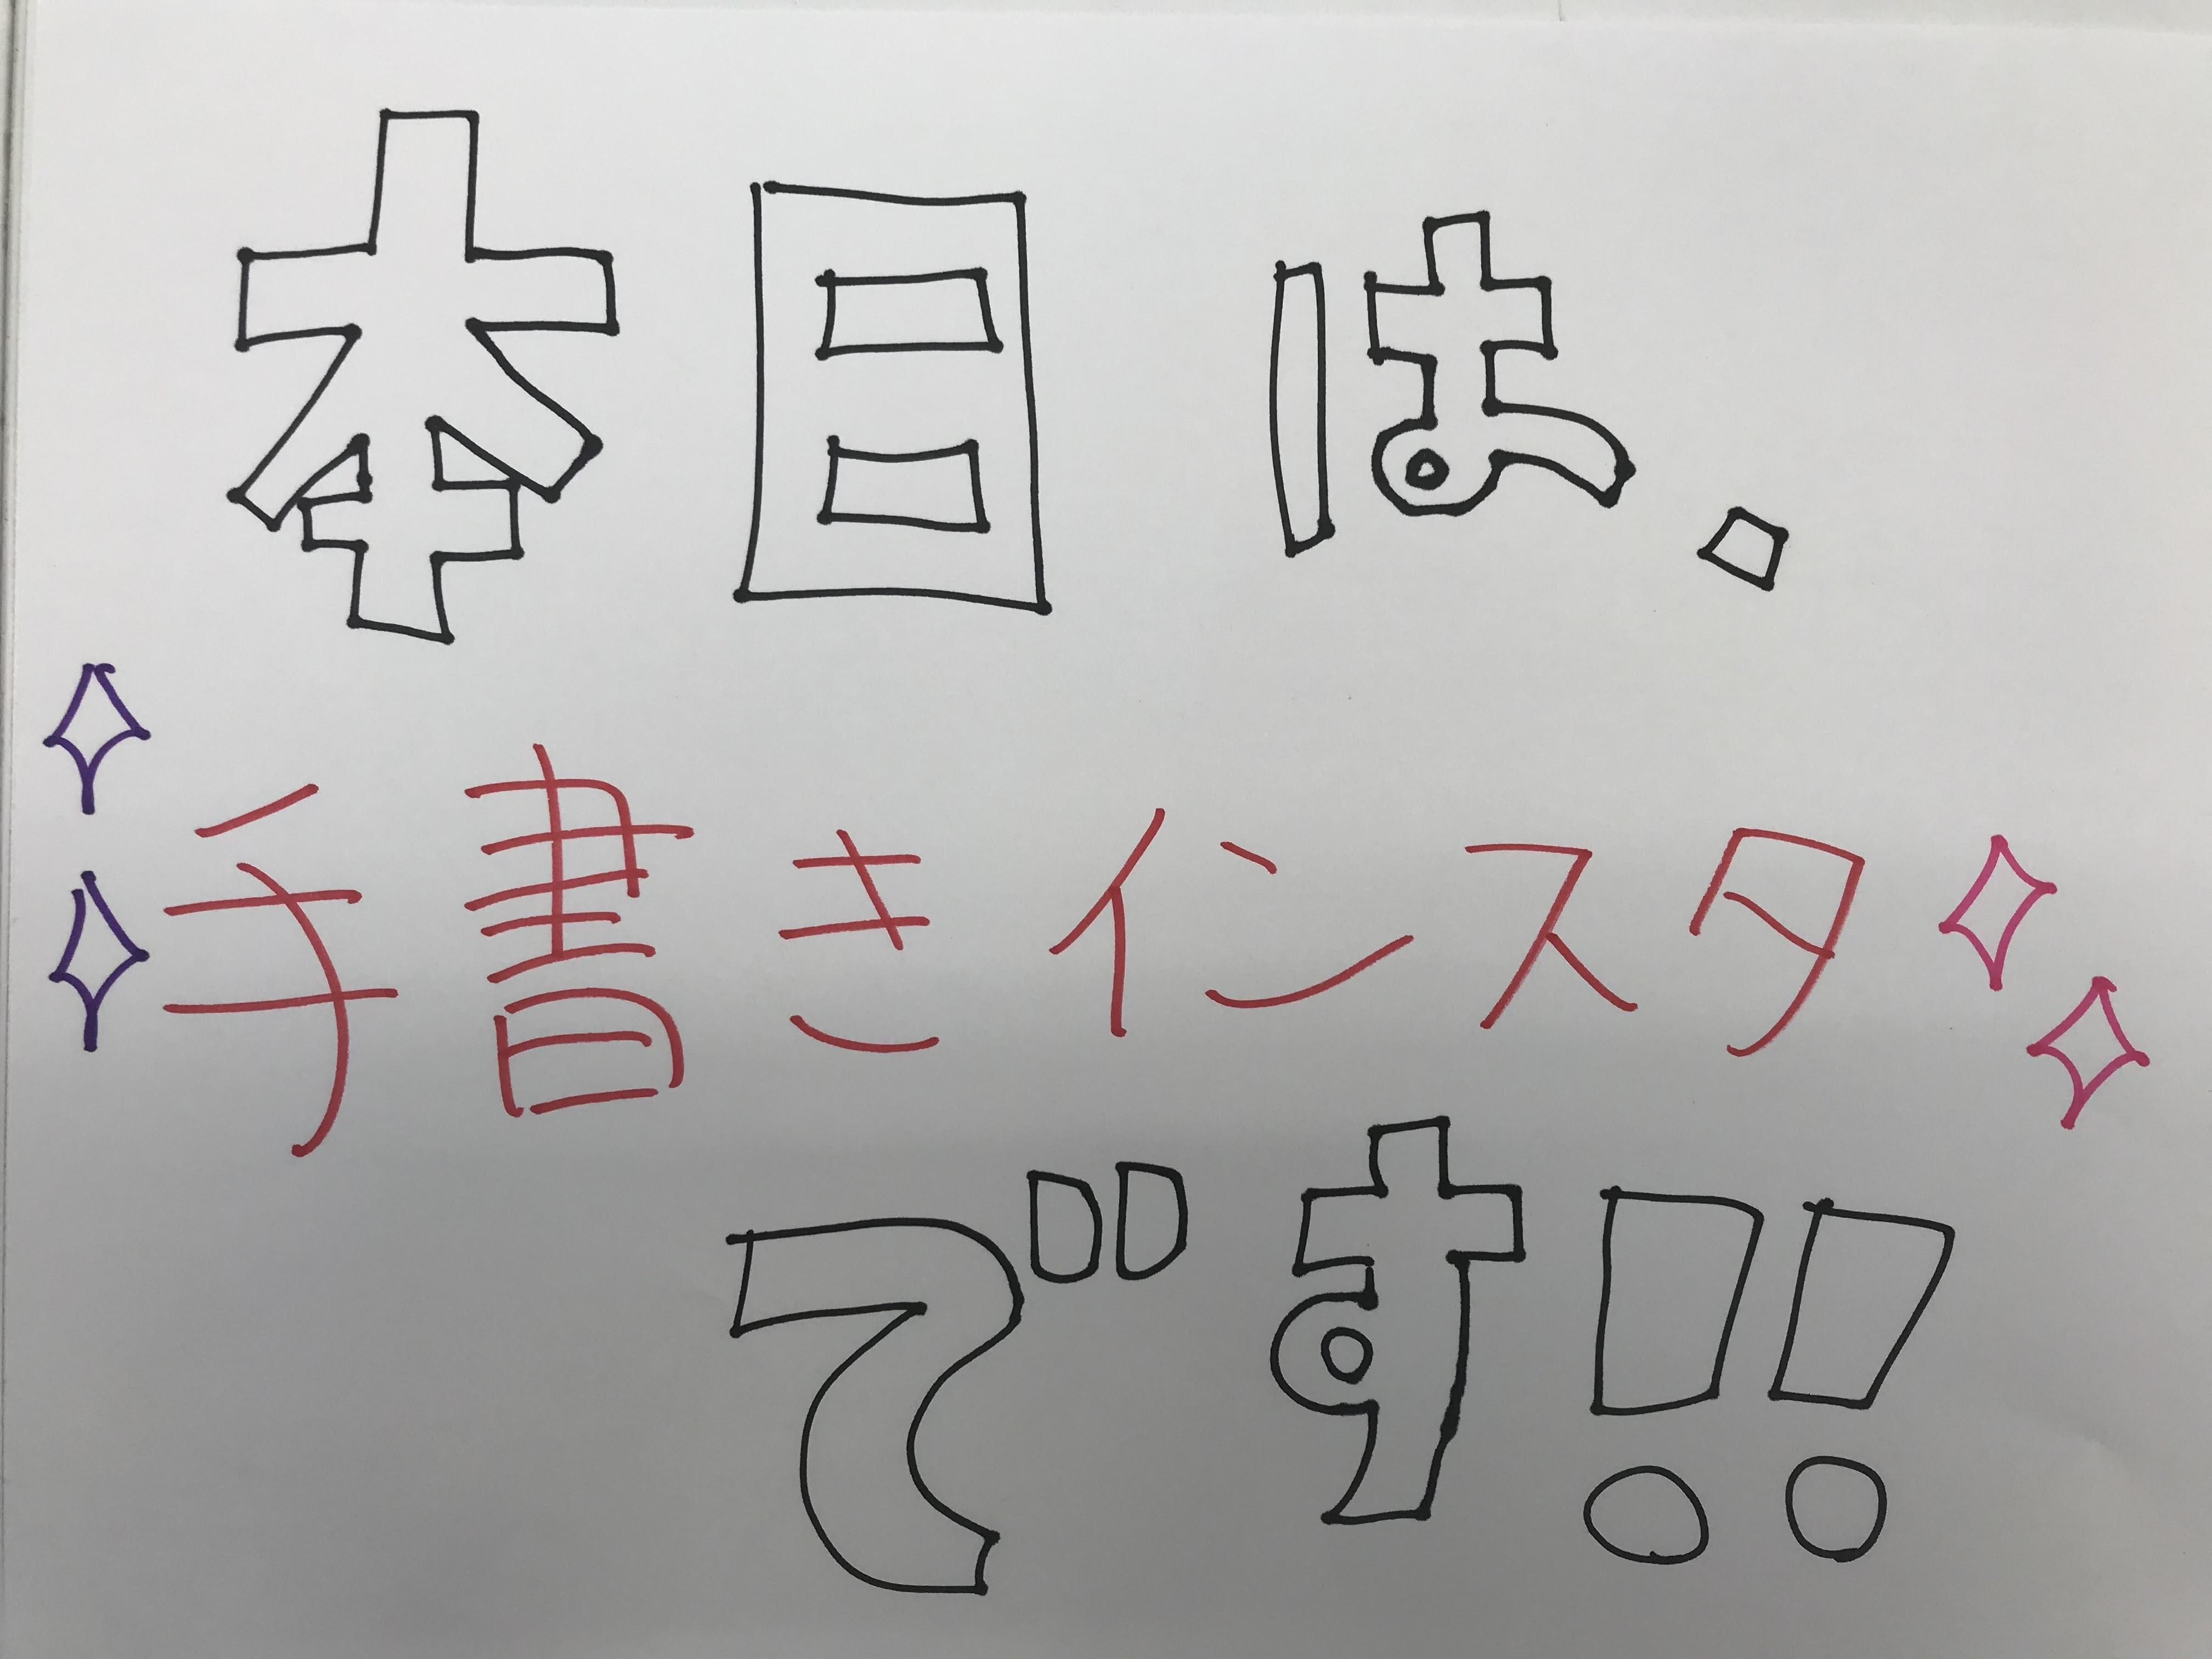 https://chsc.jp/news/up_images/%EF%BC%8323%281%29.jpg